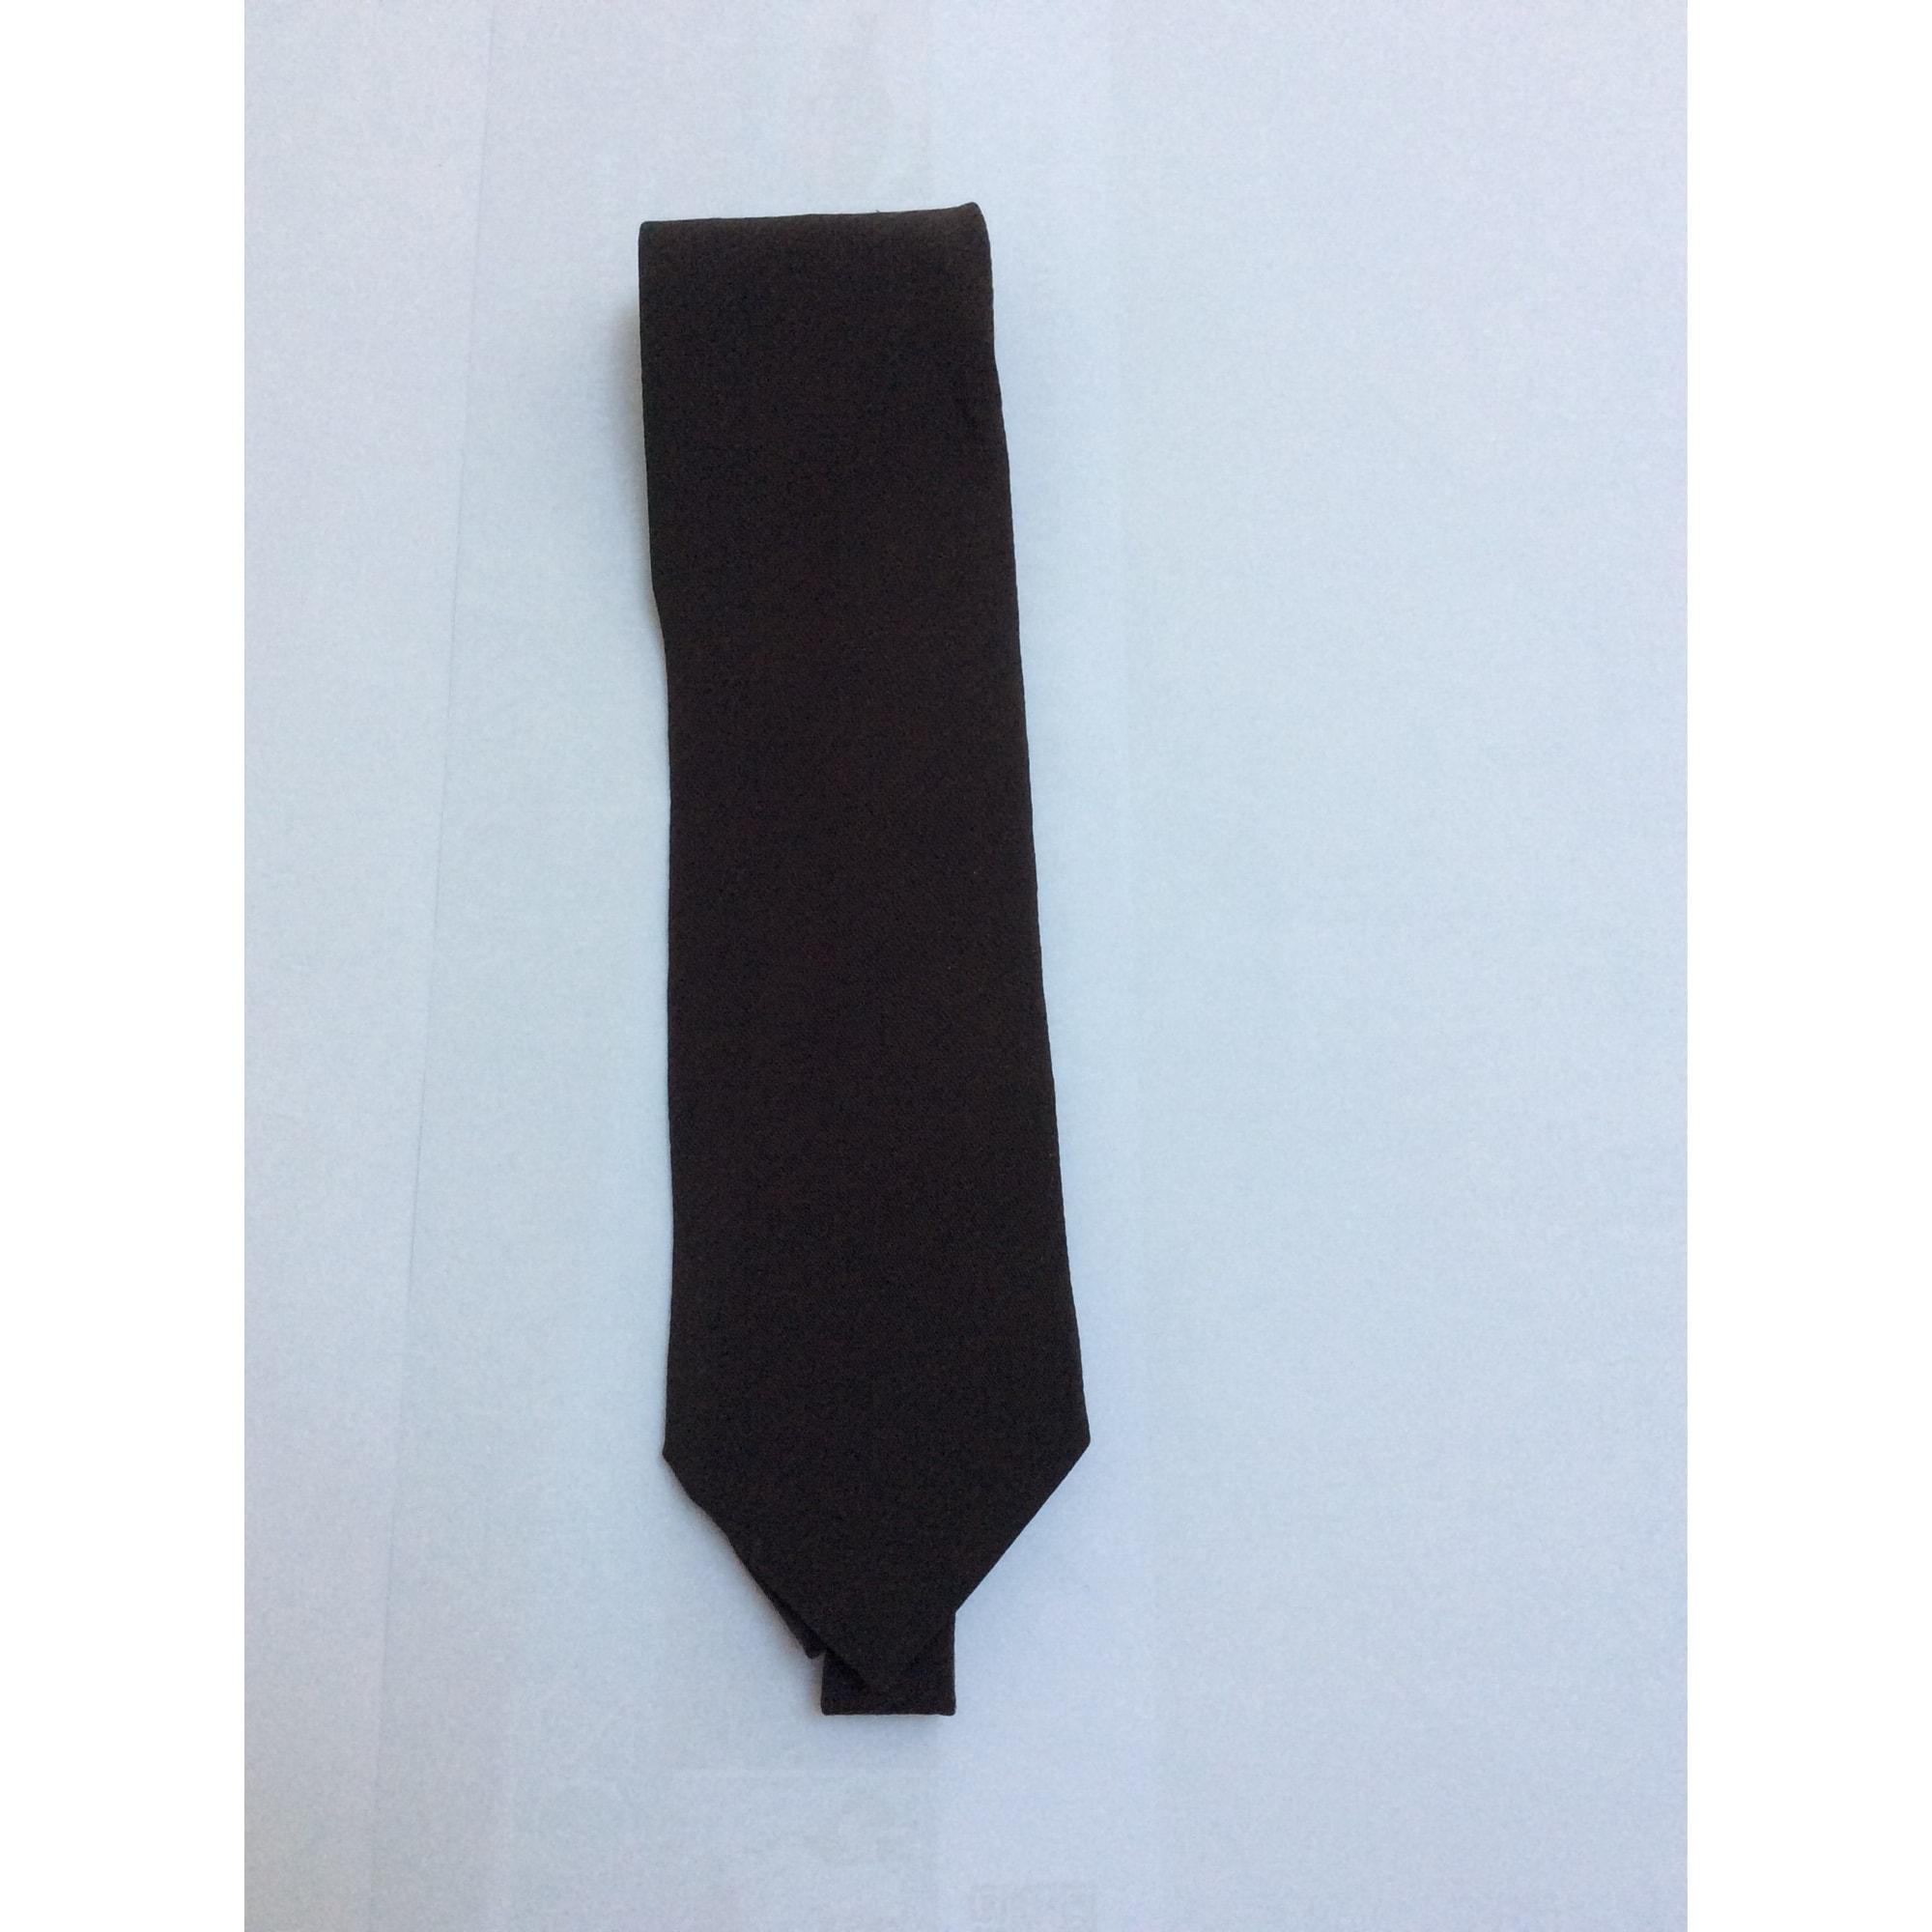 Cravate ARMANI Marron